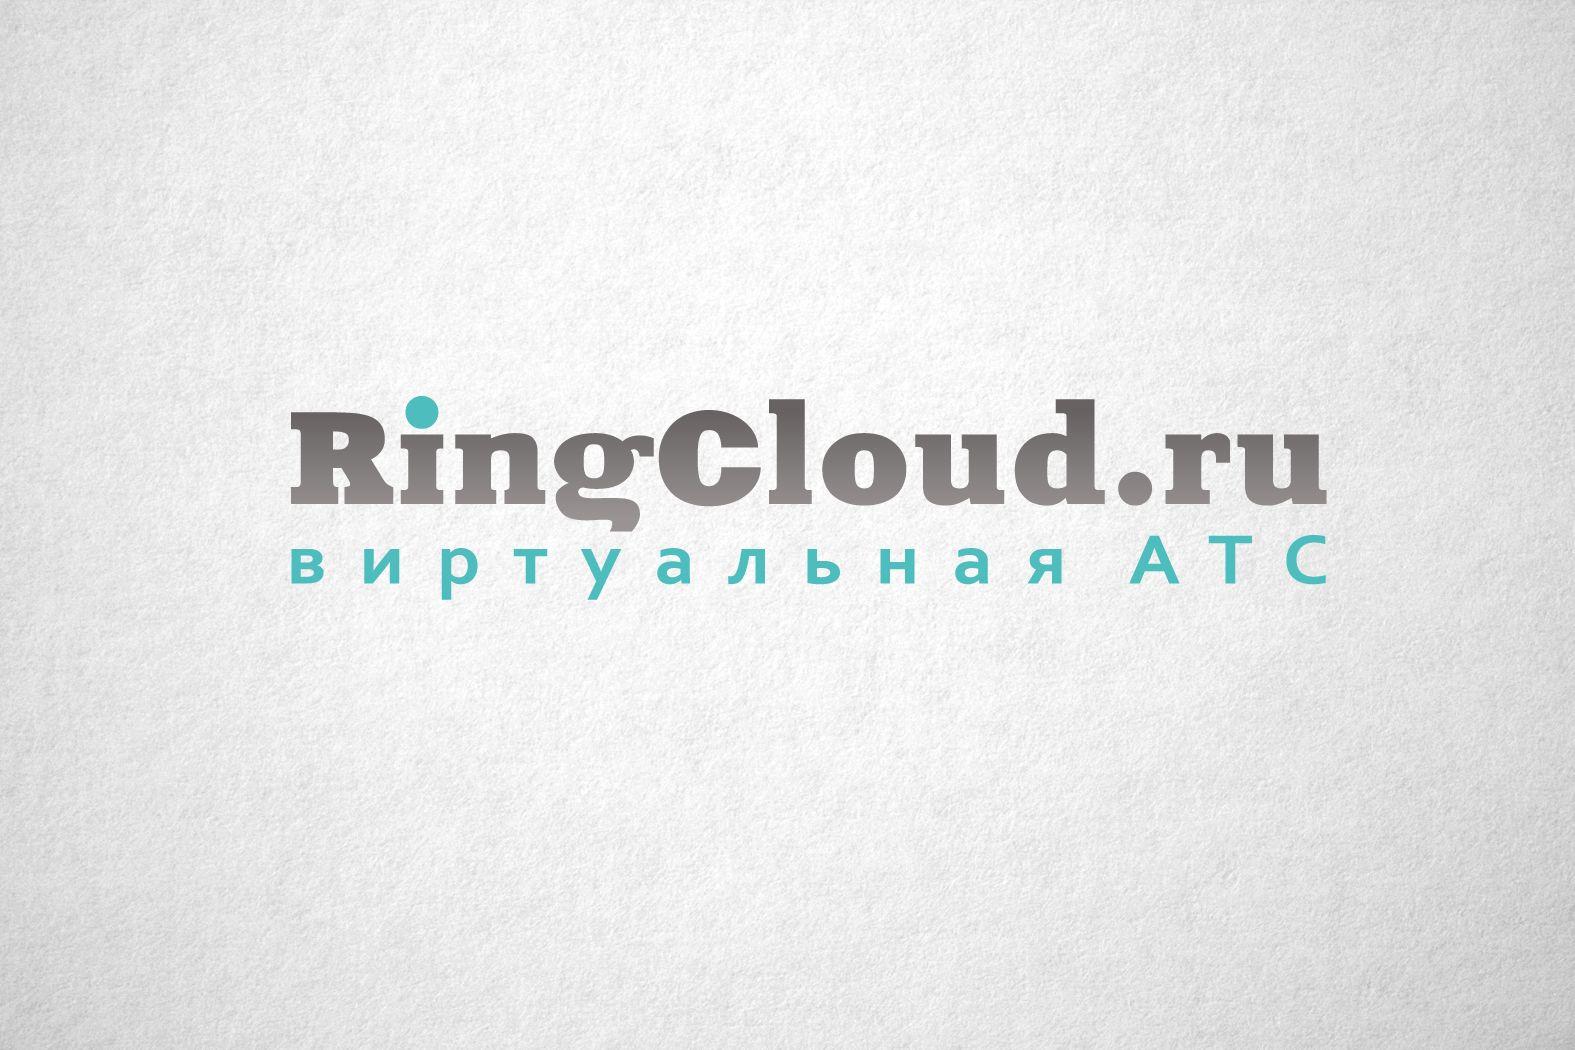 Логотип RingCloud.ru - дизайнер funkielevis